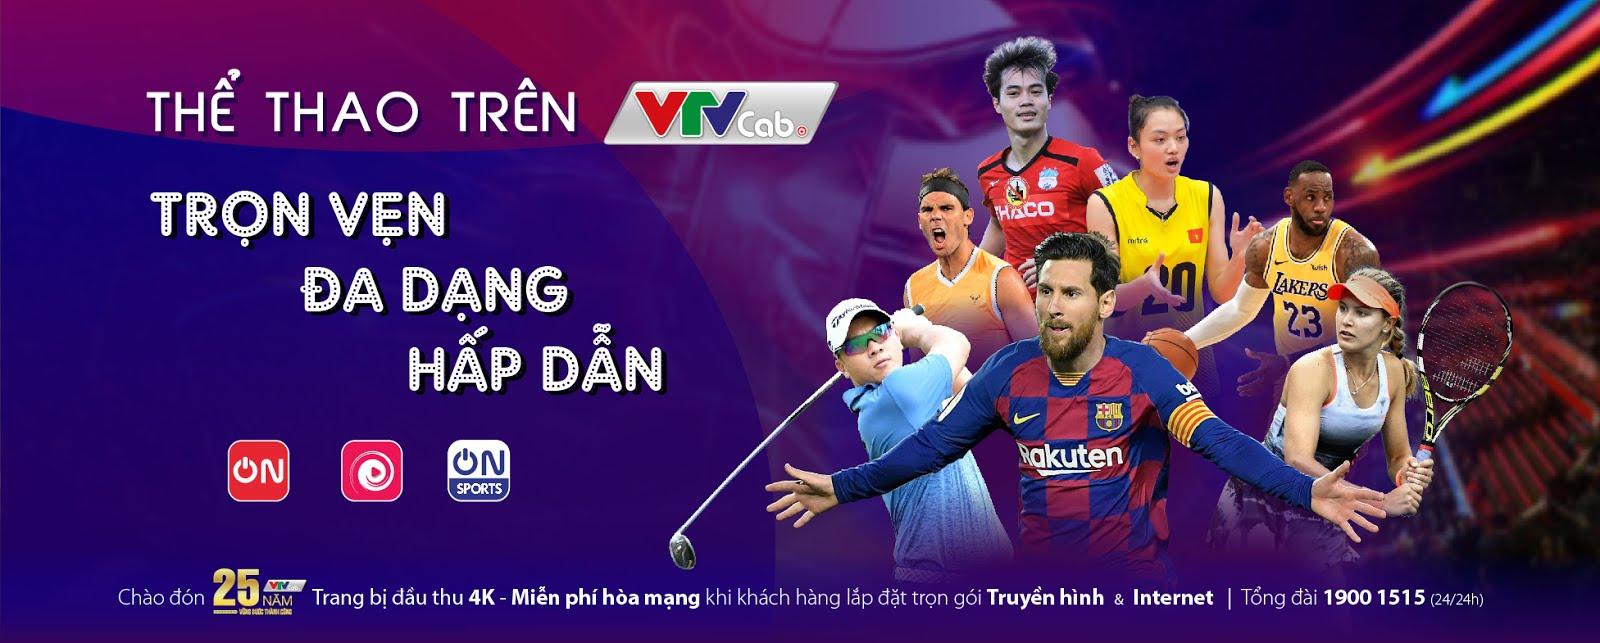 VTVcab Thể thao